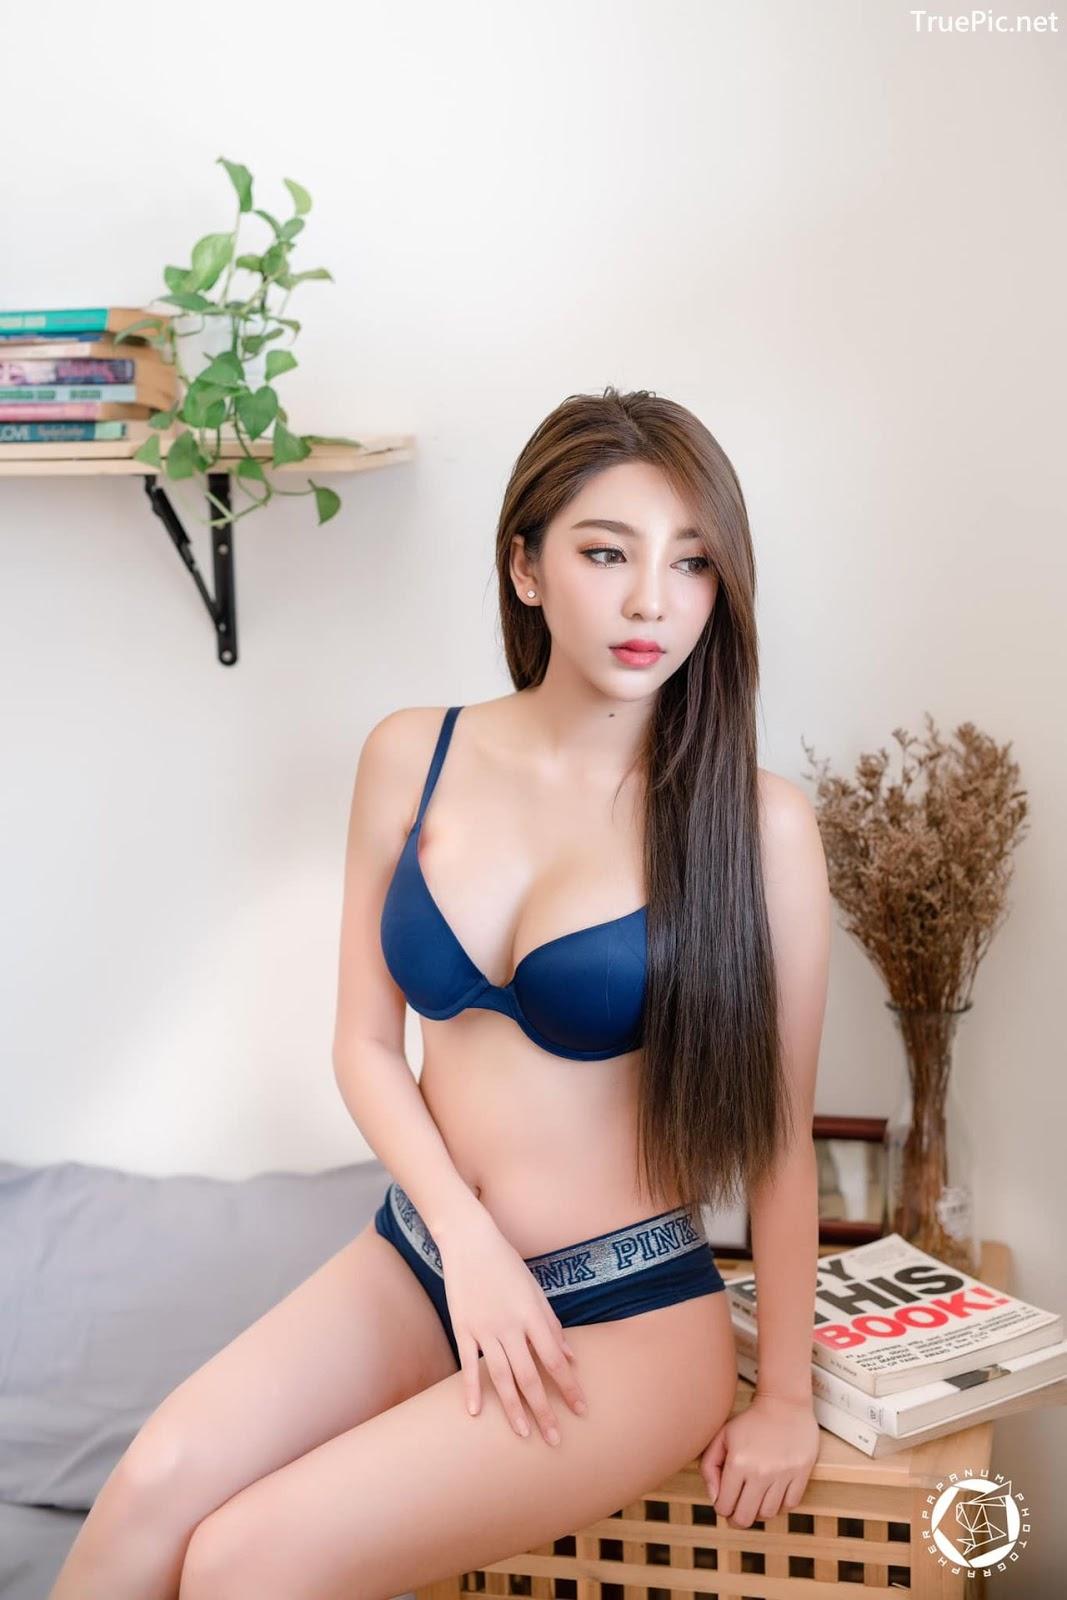 Image-Thailand-Sexy-Model-Printlaaplus-Zhaengchohm-Navy-Blue-Lingerie-TruePic.net- Picture-4